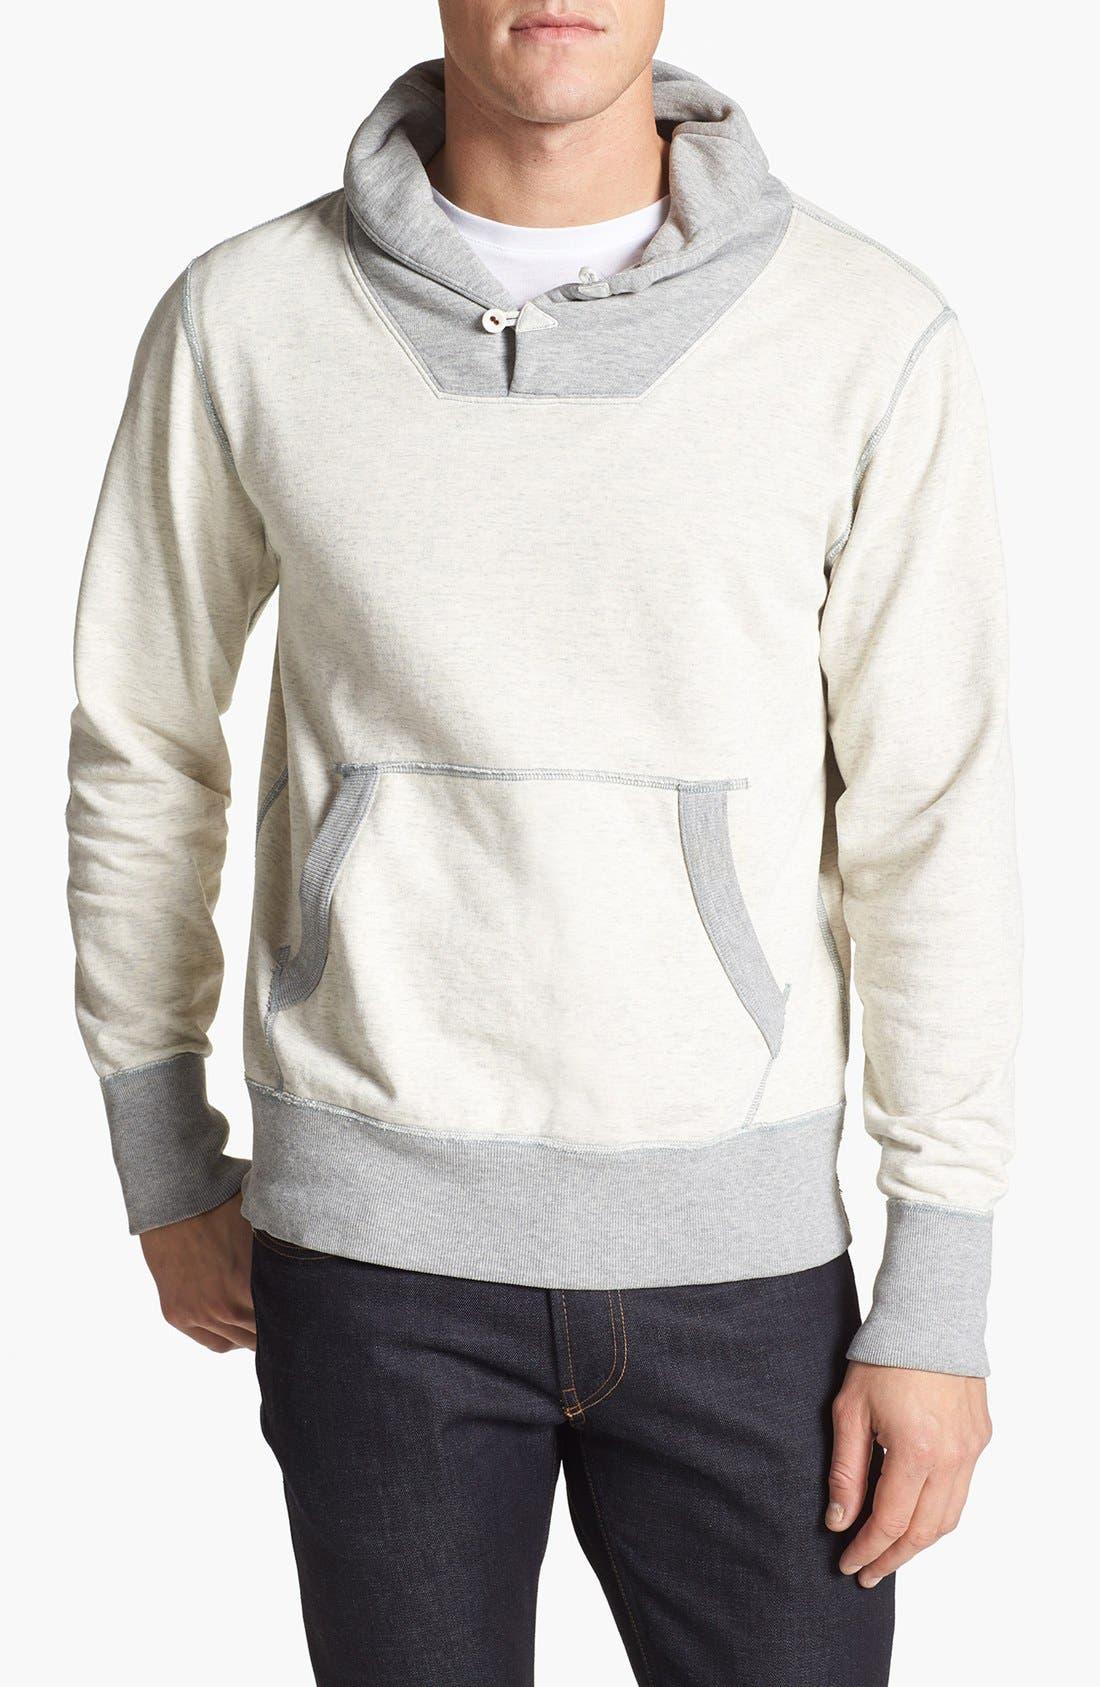 TODD SNYDER + CHAMPION, Shawl Collar Sweatshirt, Main thumbnail 1, color, 050